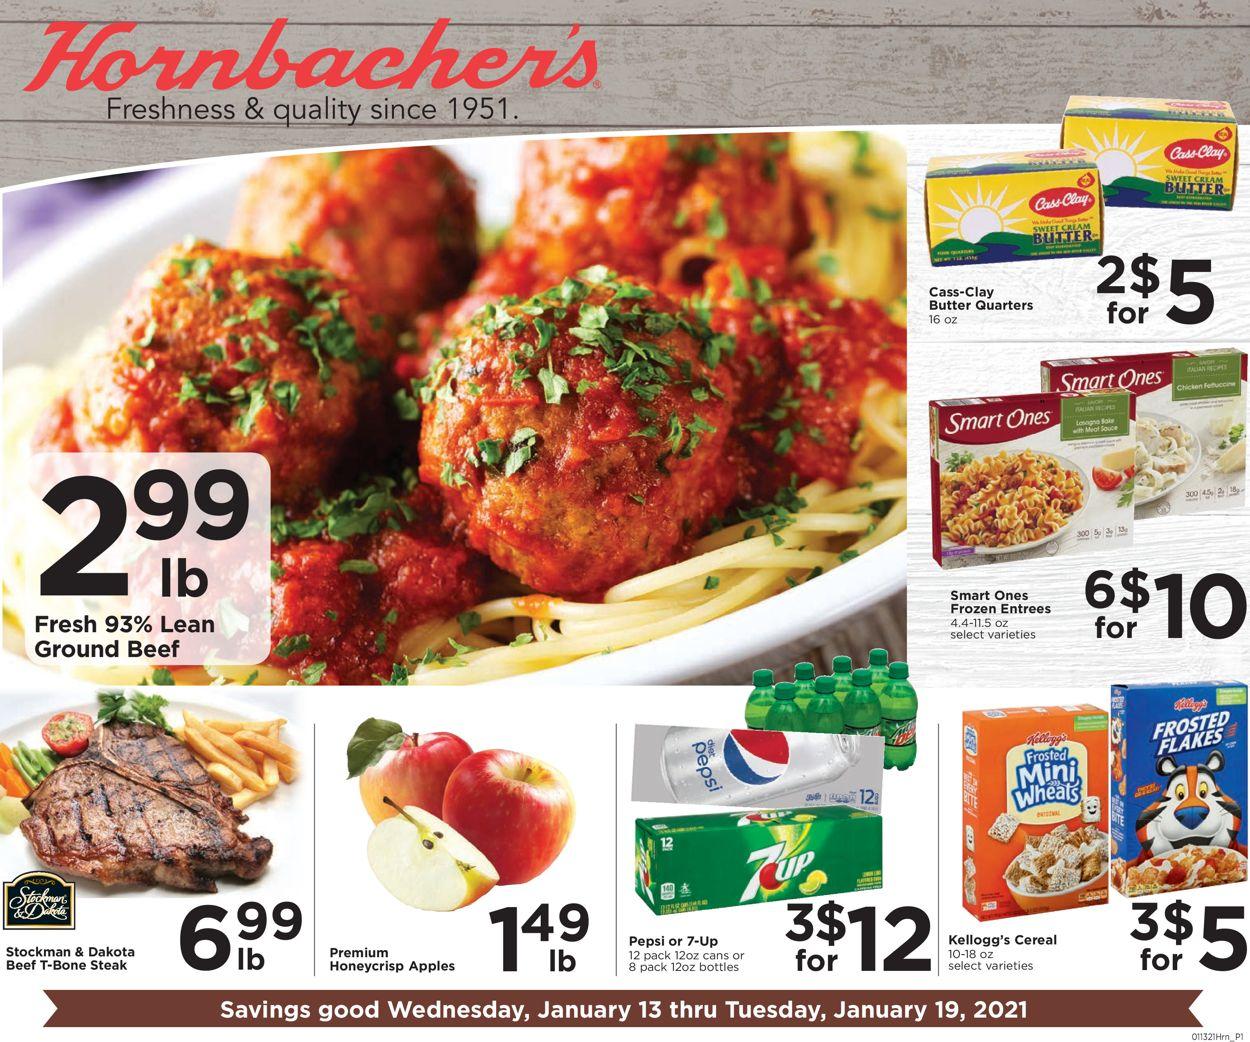 Hornbacher's Weekly Ad Circular - valid 01/13-01/19/2021